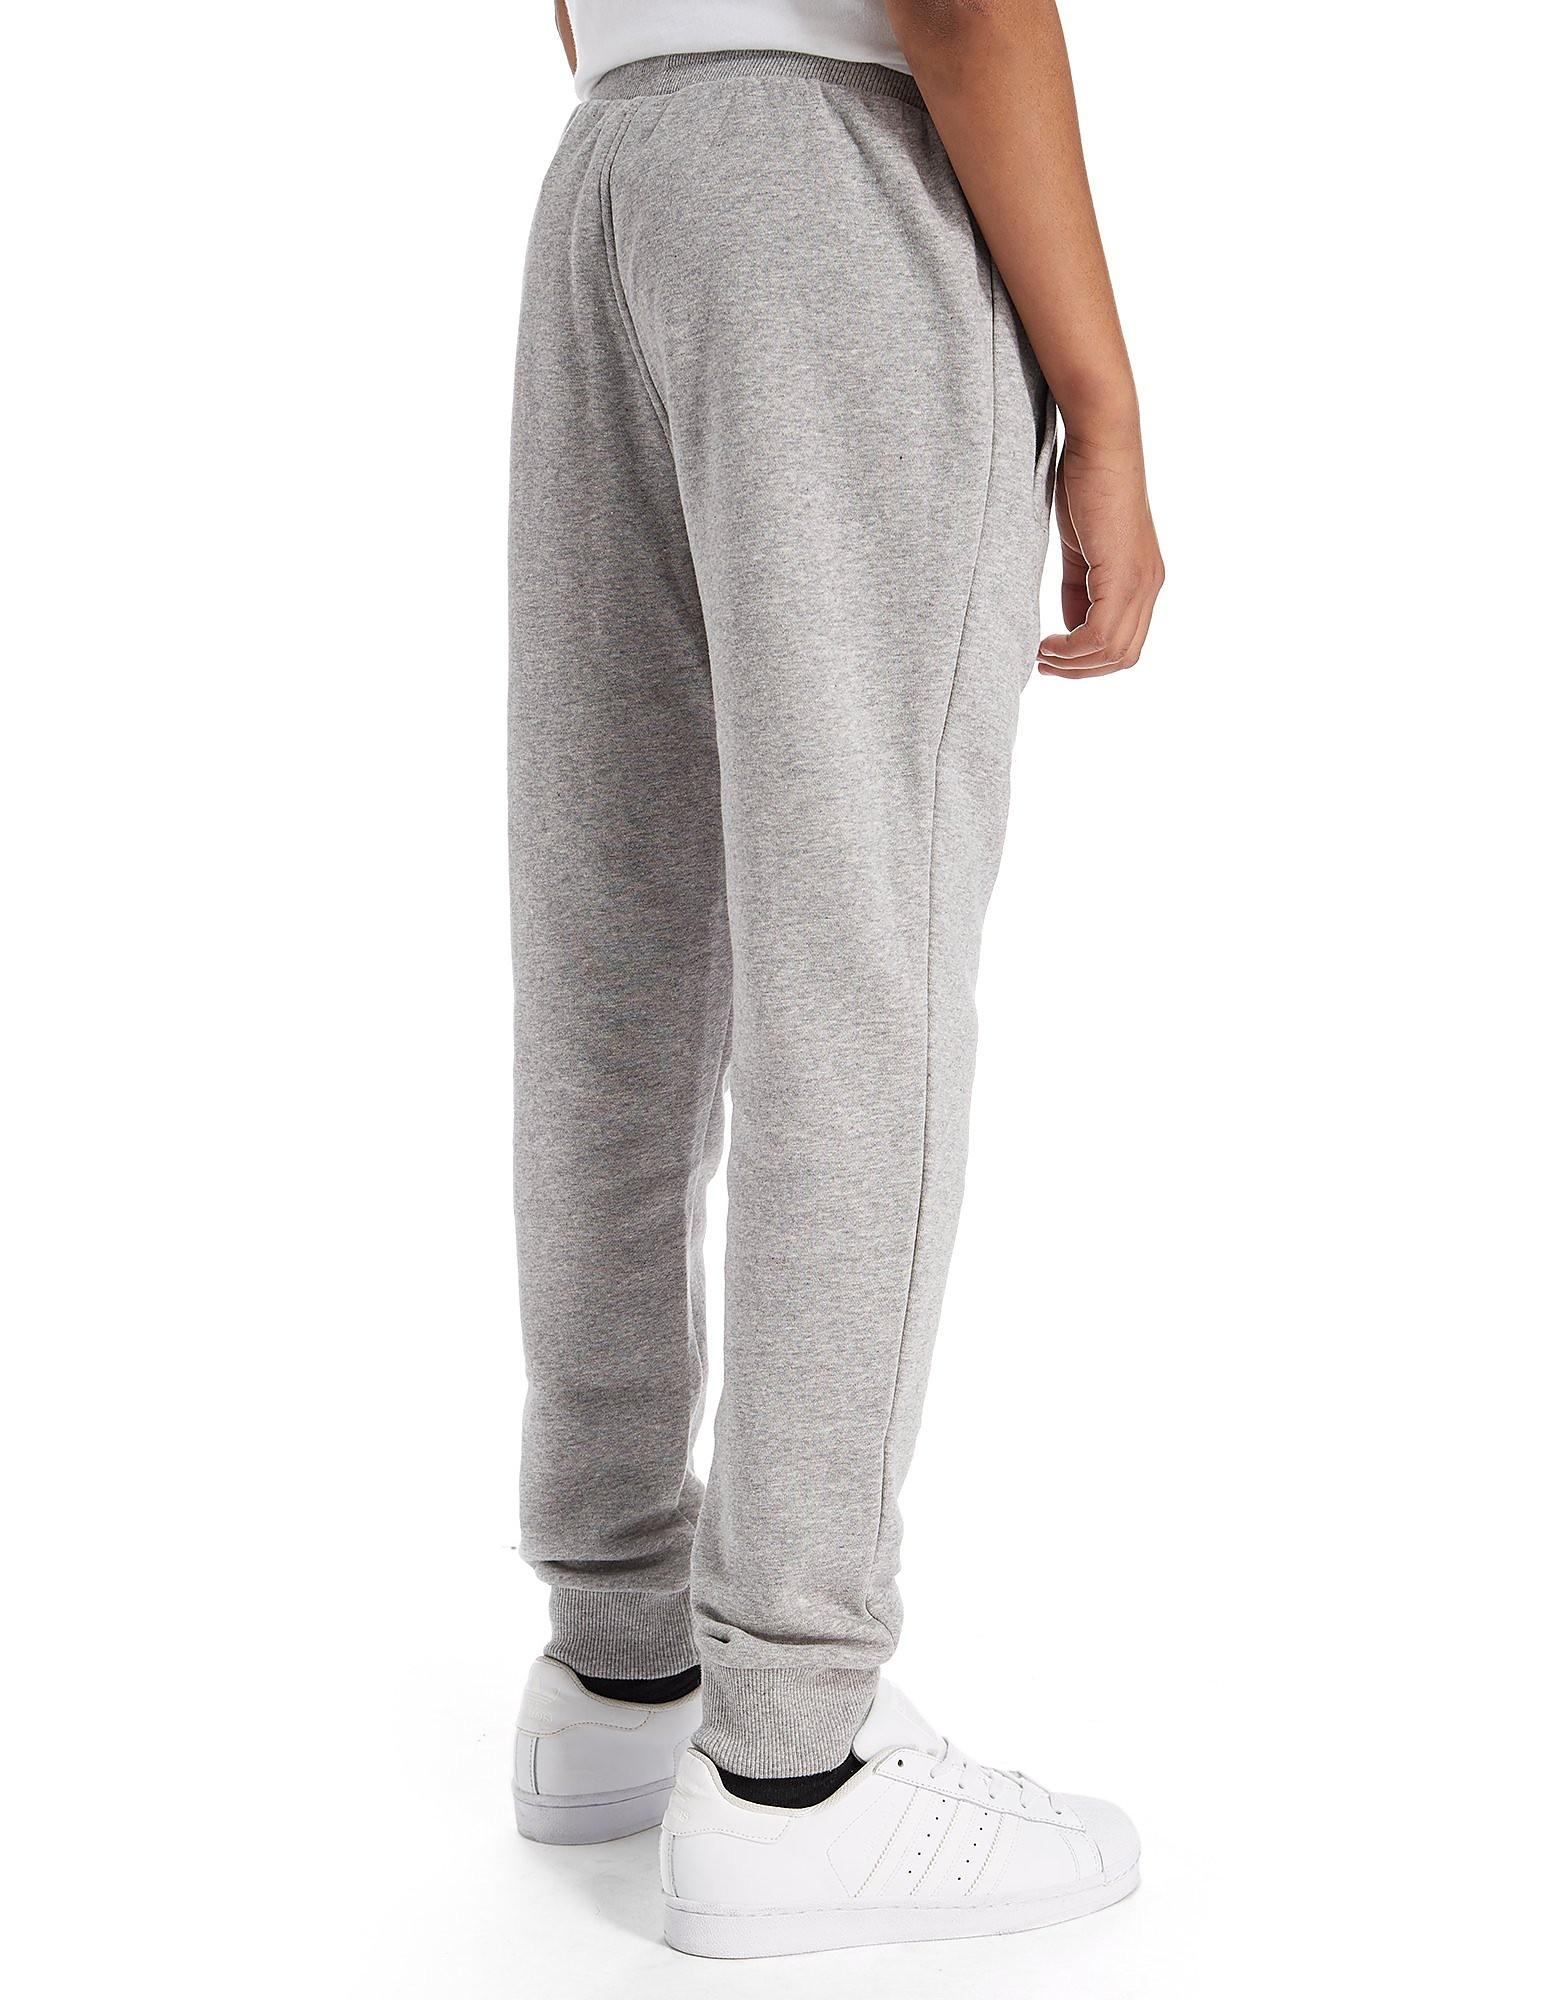 adidas Originals Slank joggingunderdel – junior